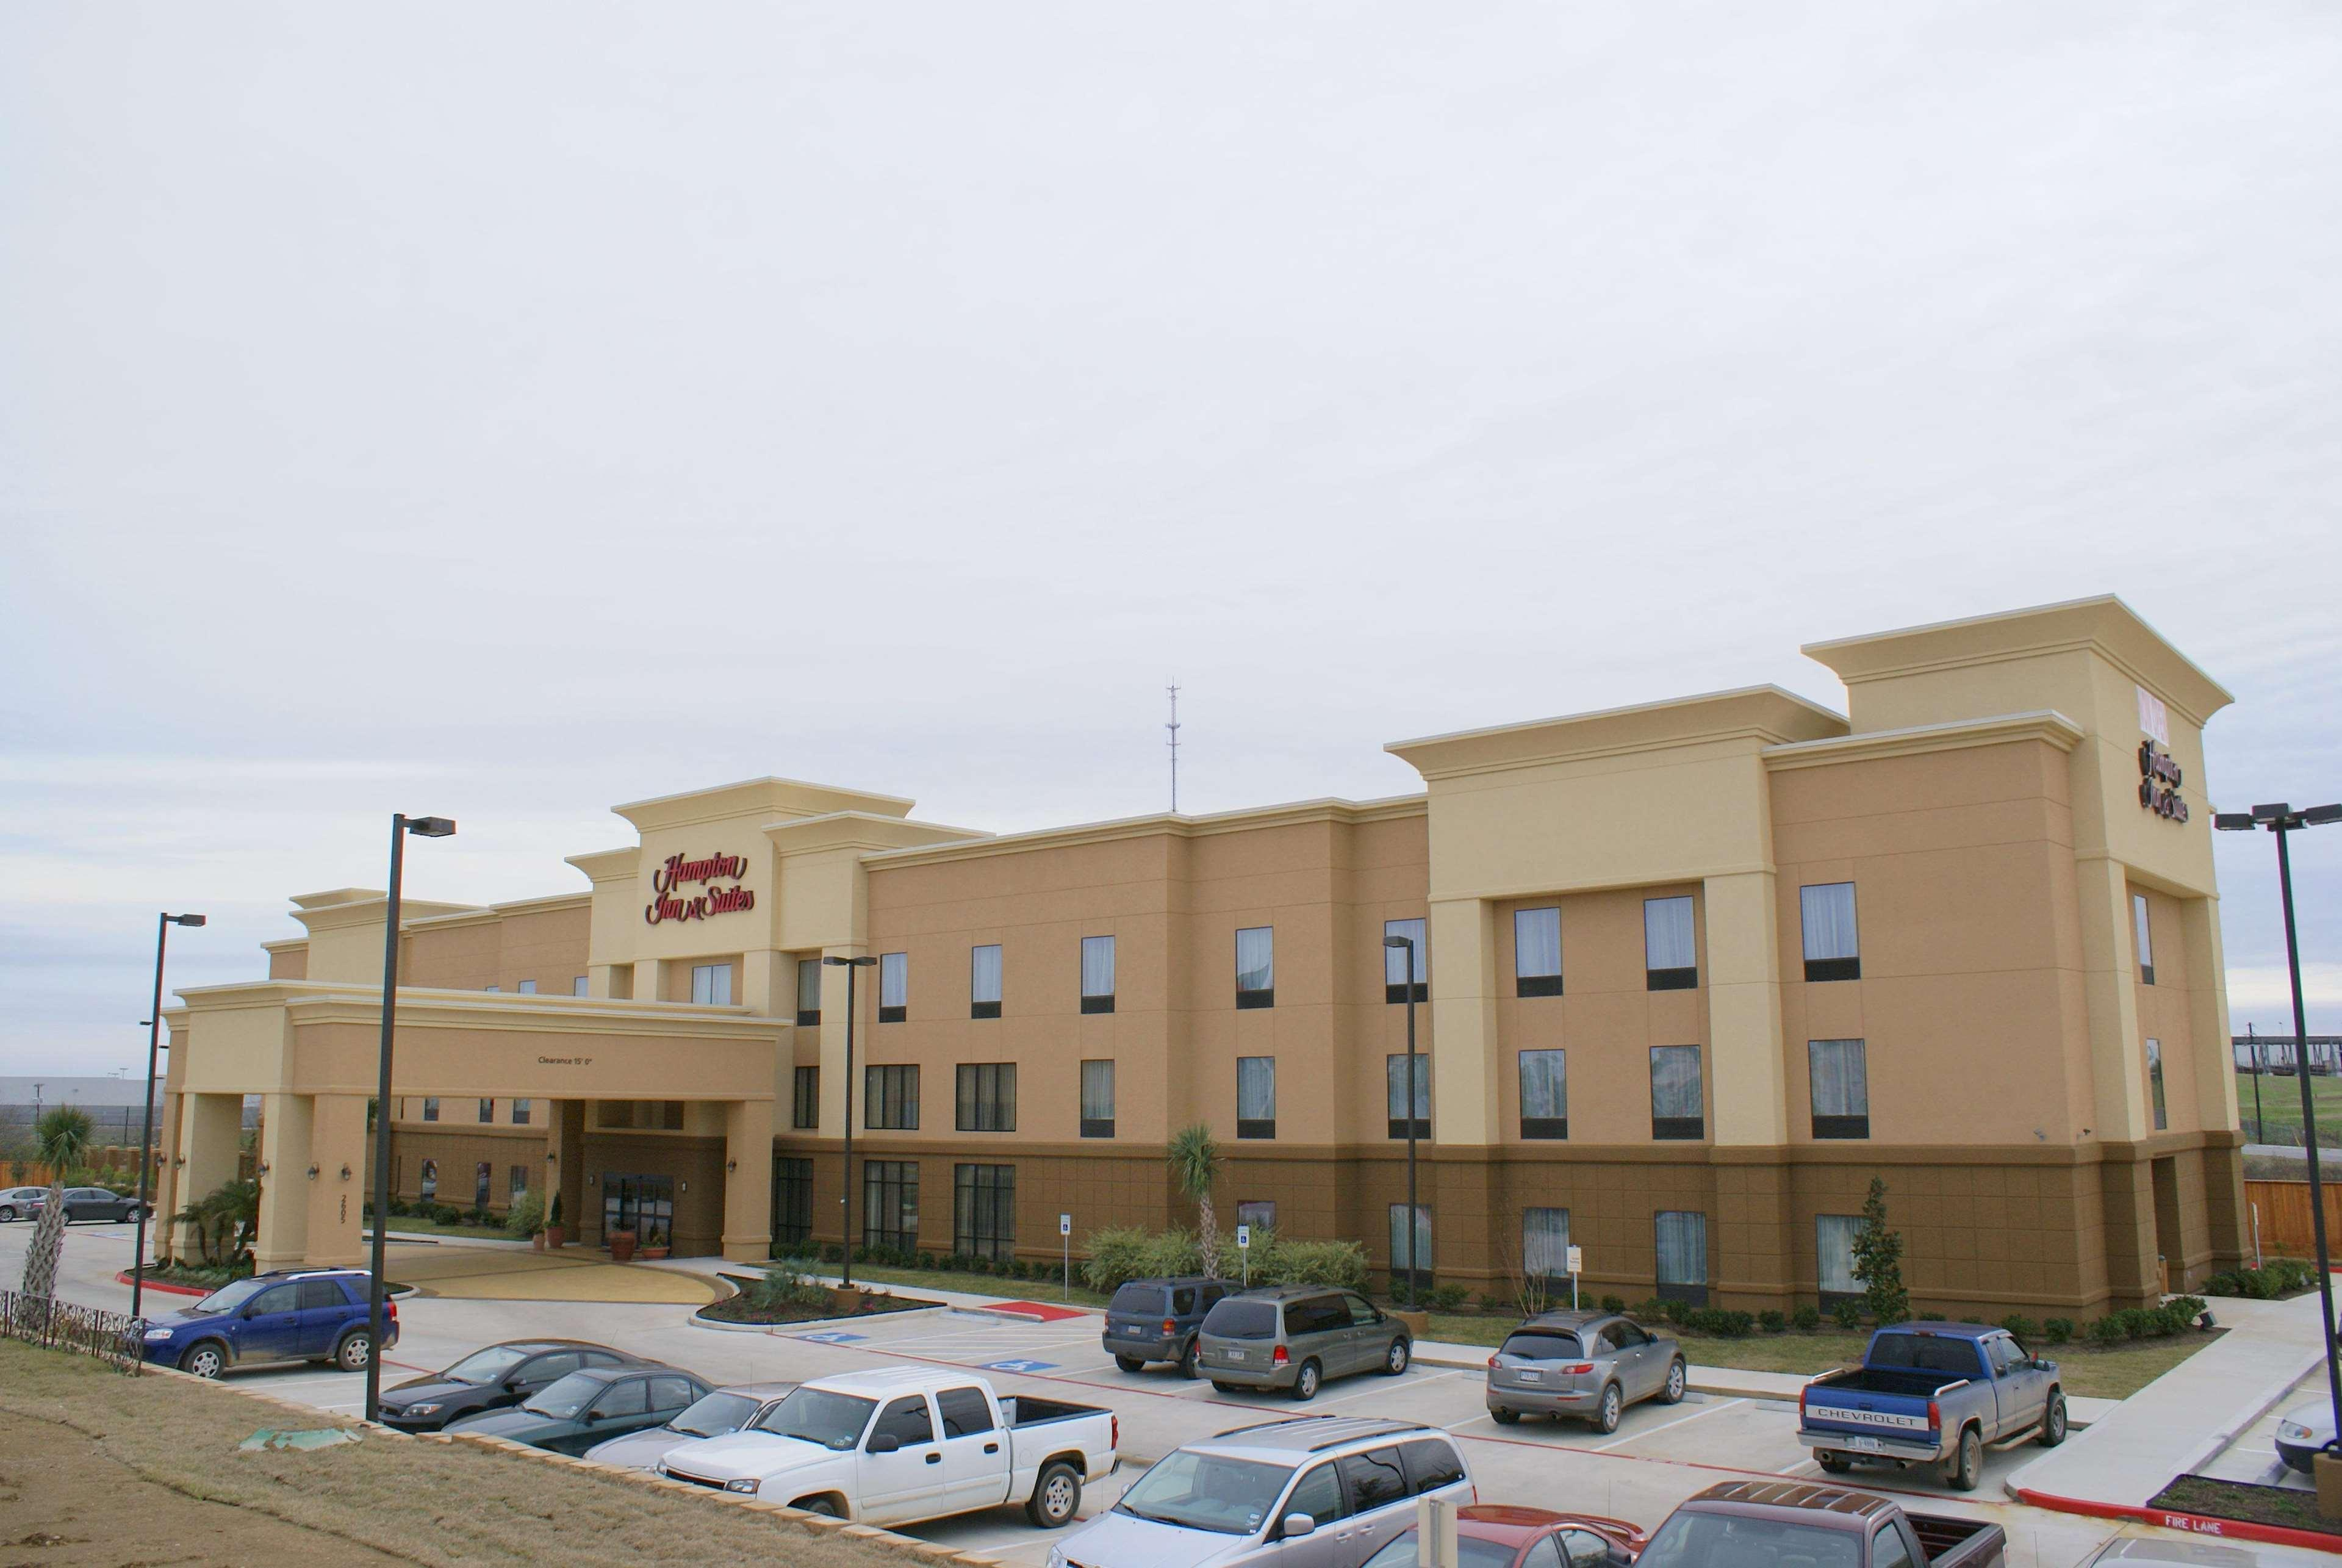 Hampton Inn & Suites Brenham, Washington